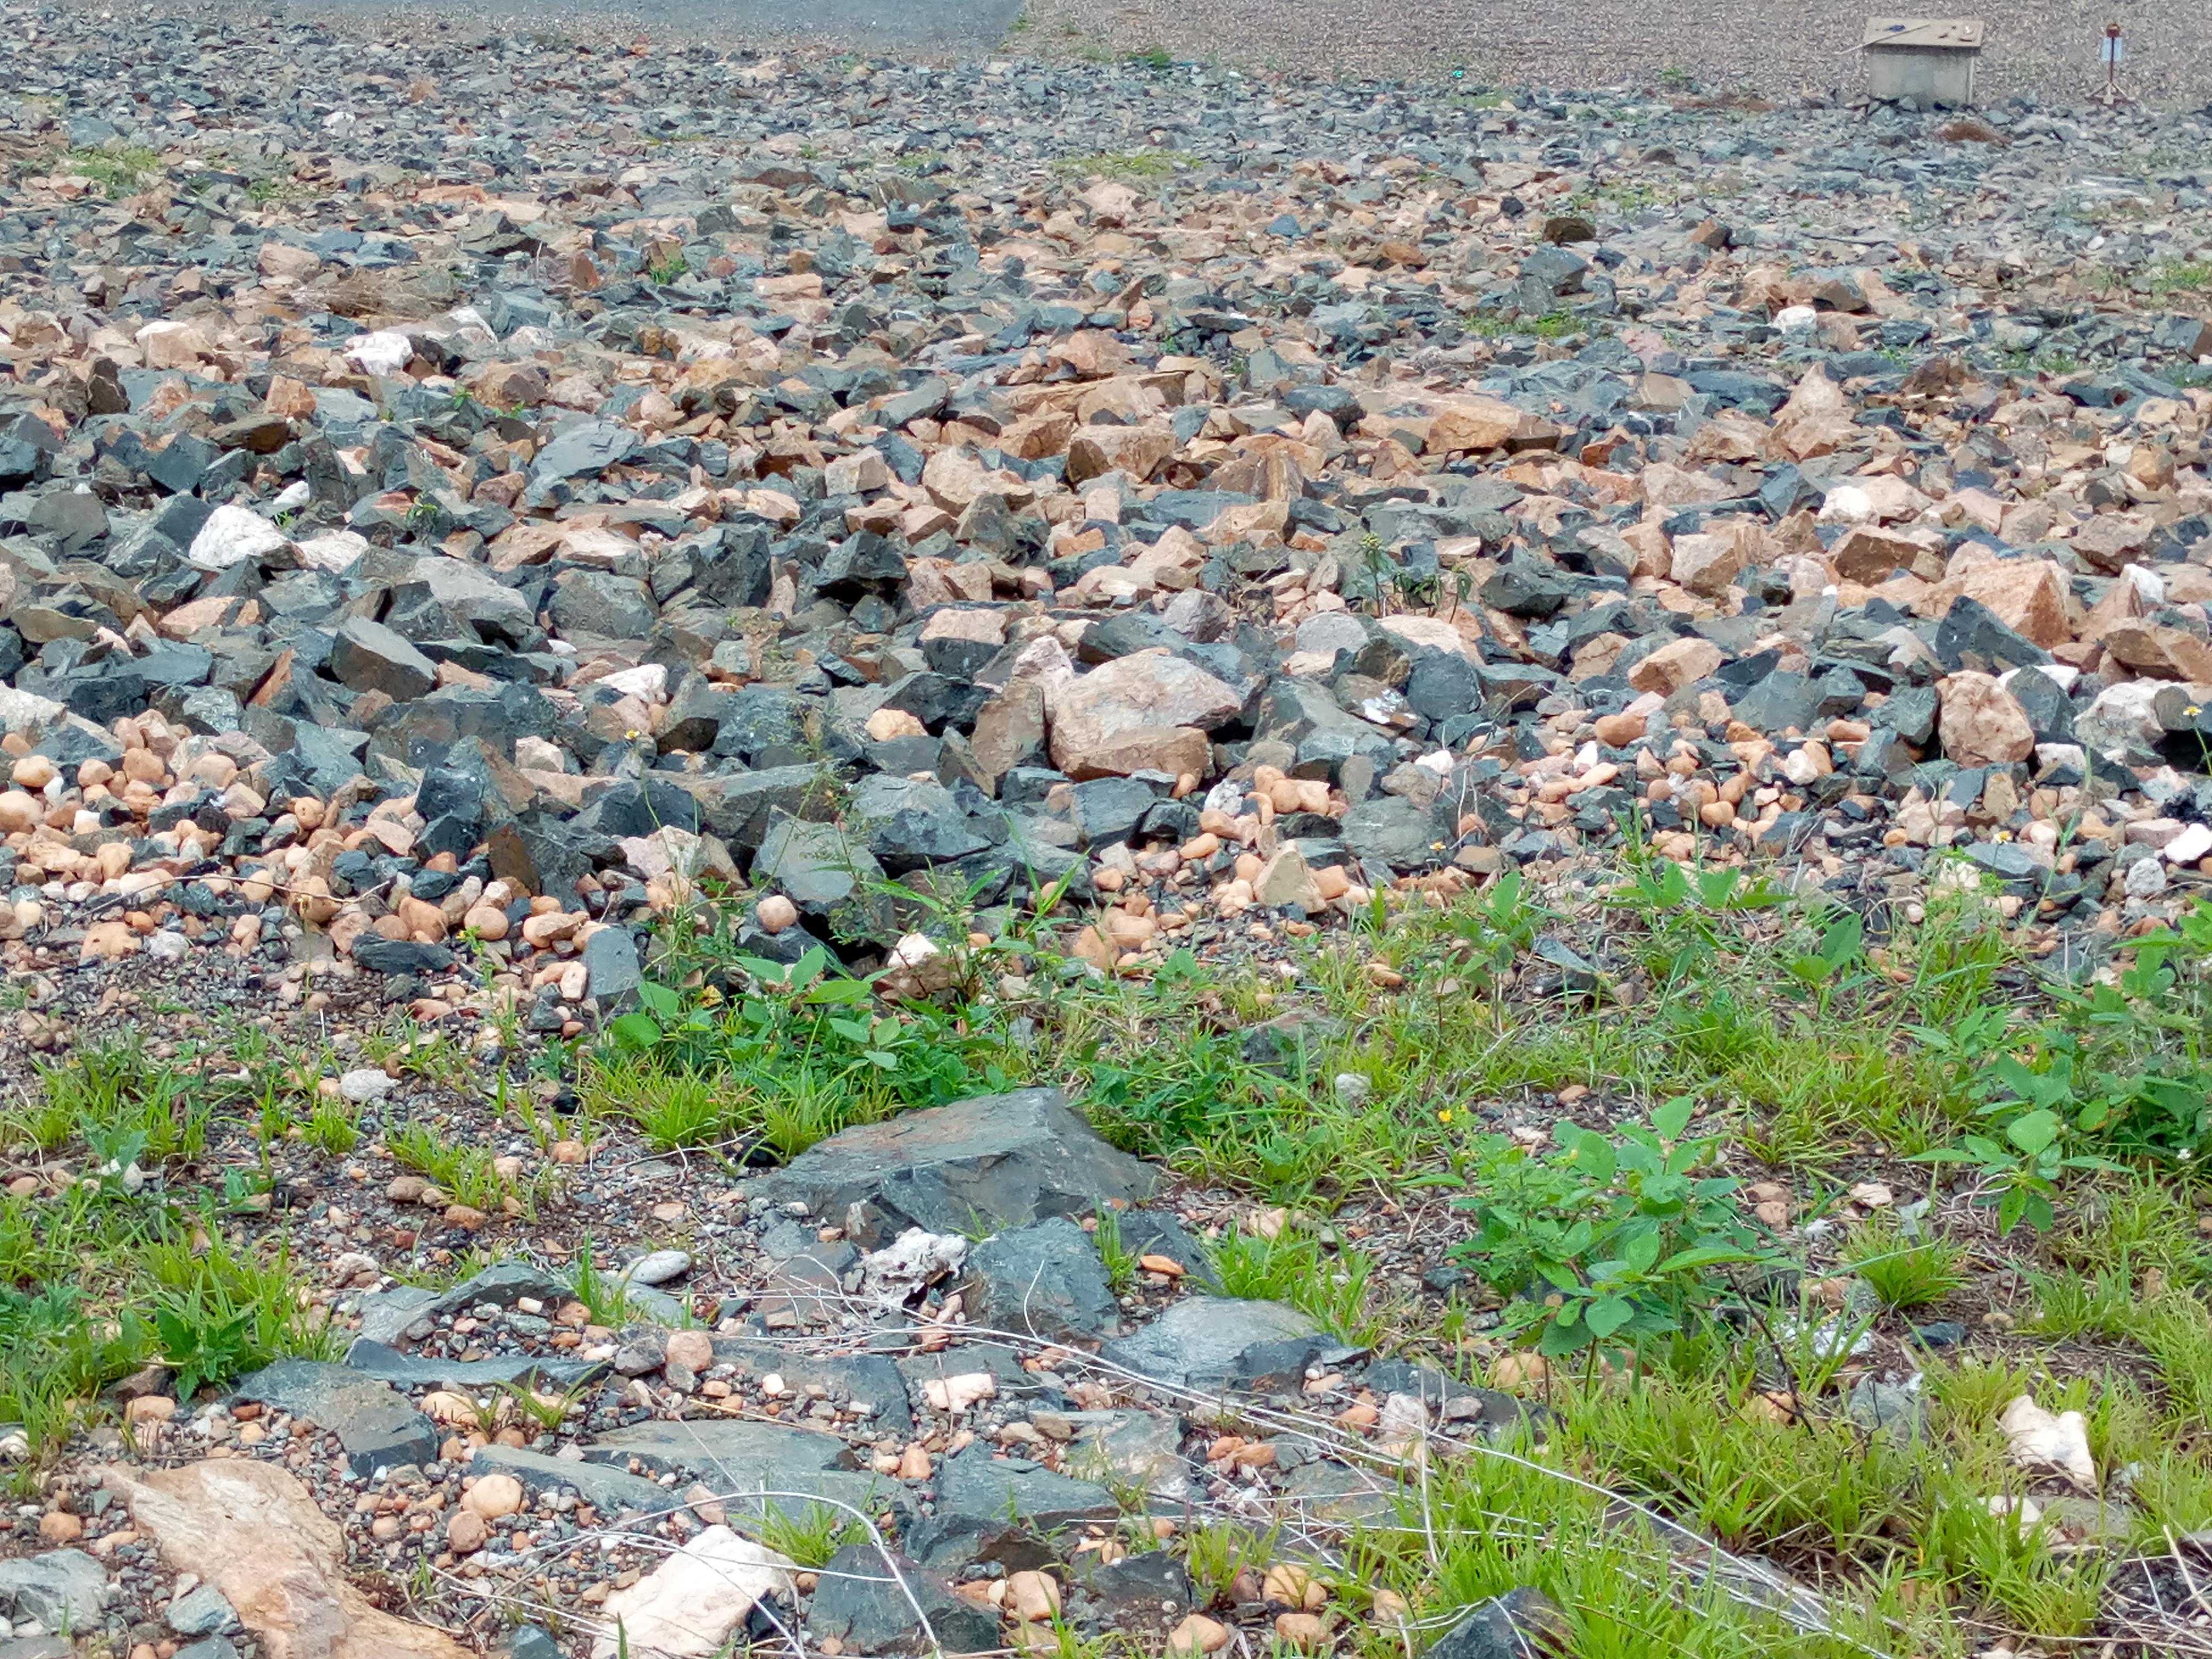 File:Un sol rocheux.jpg - Wikimedia Commons